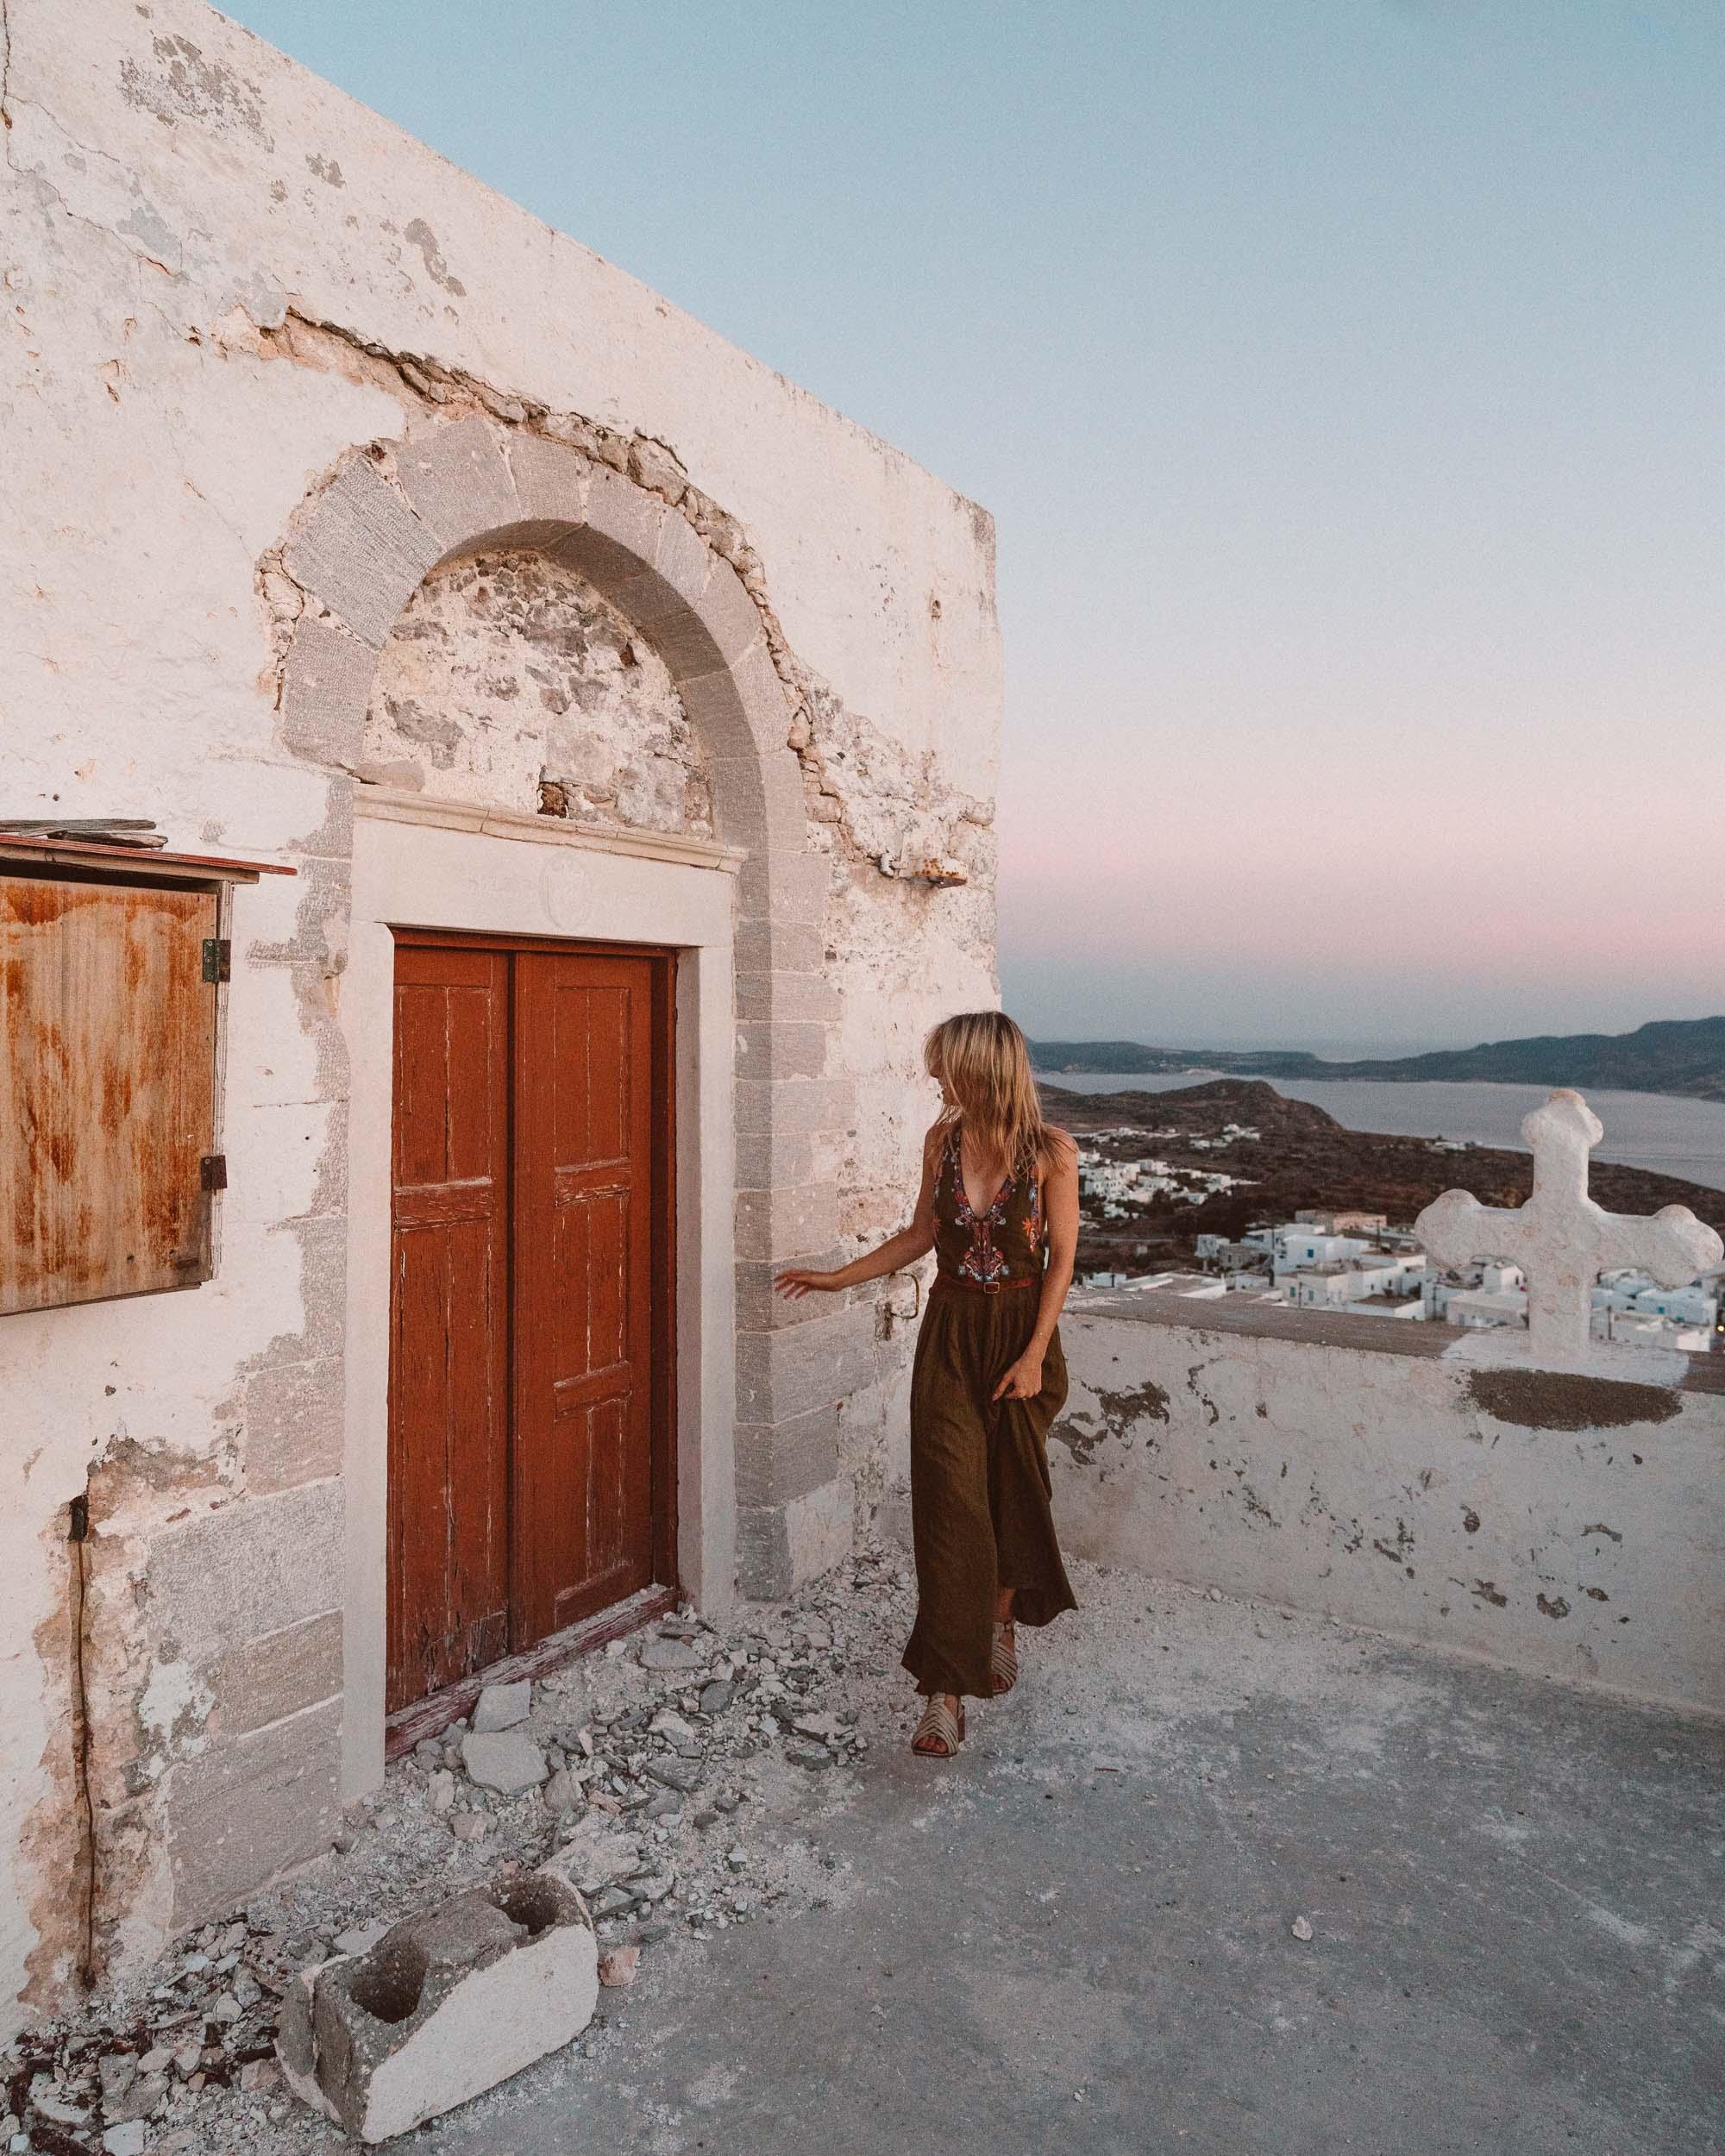 Venetian castle, Milos Greece Travel Guide via Find Us Lost